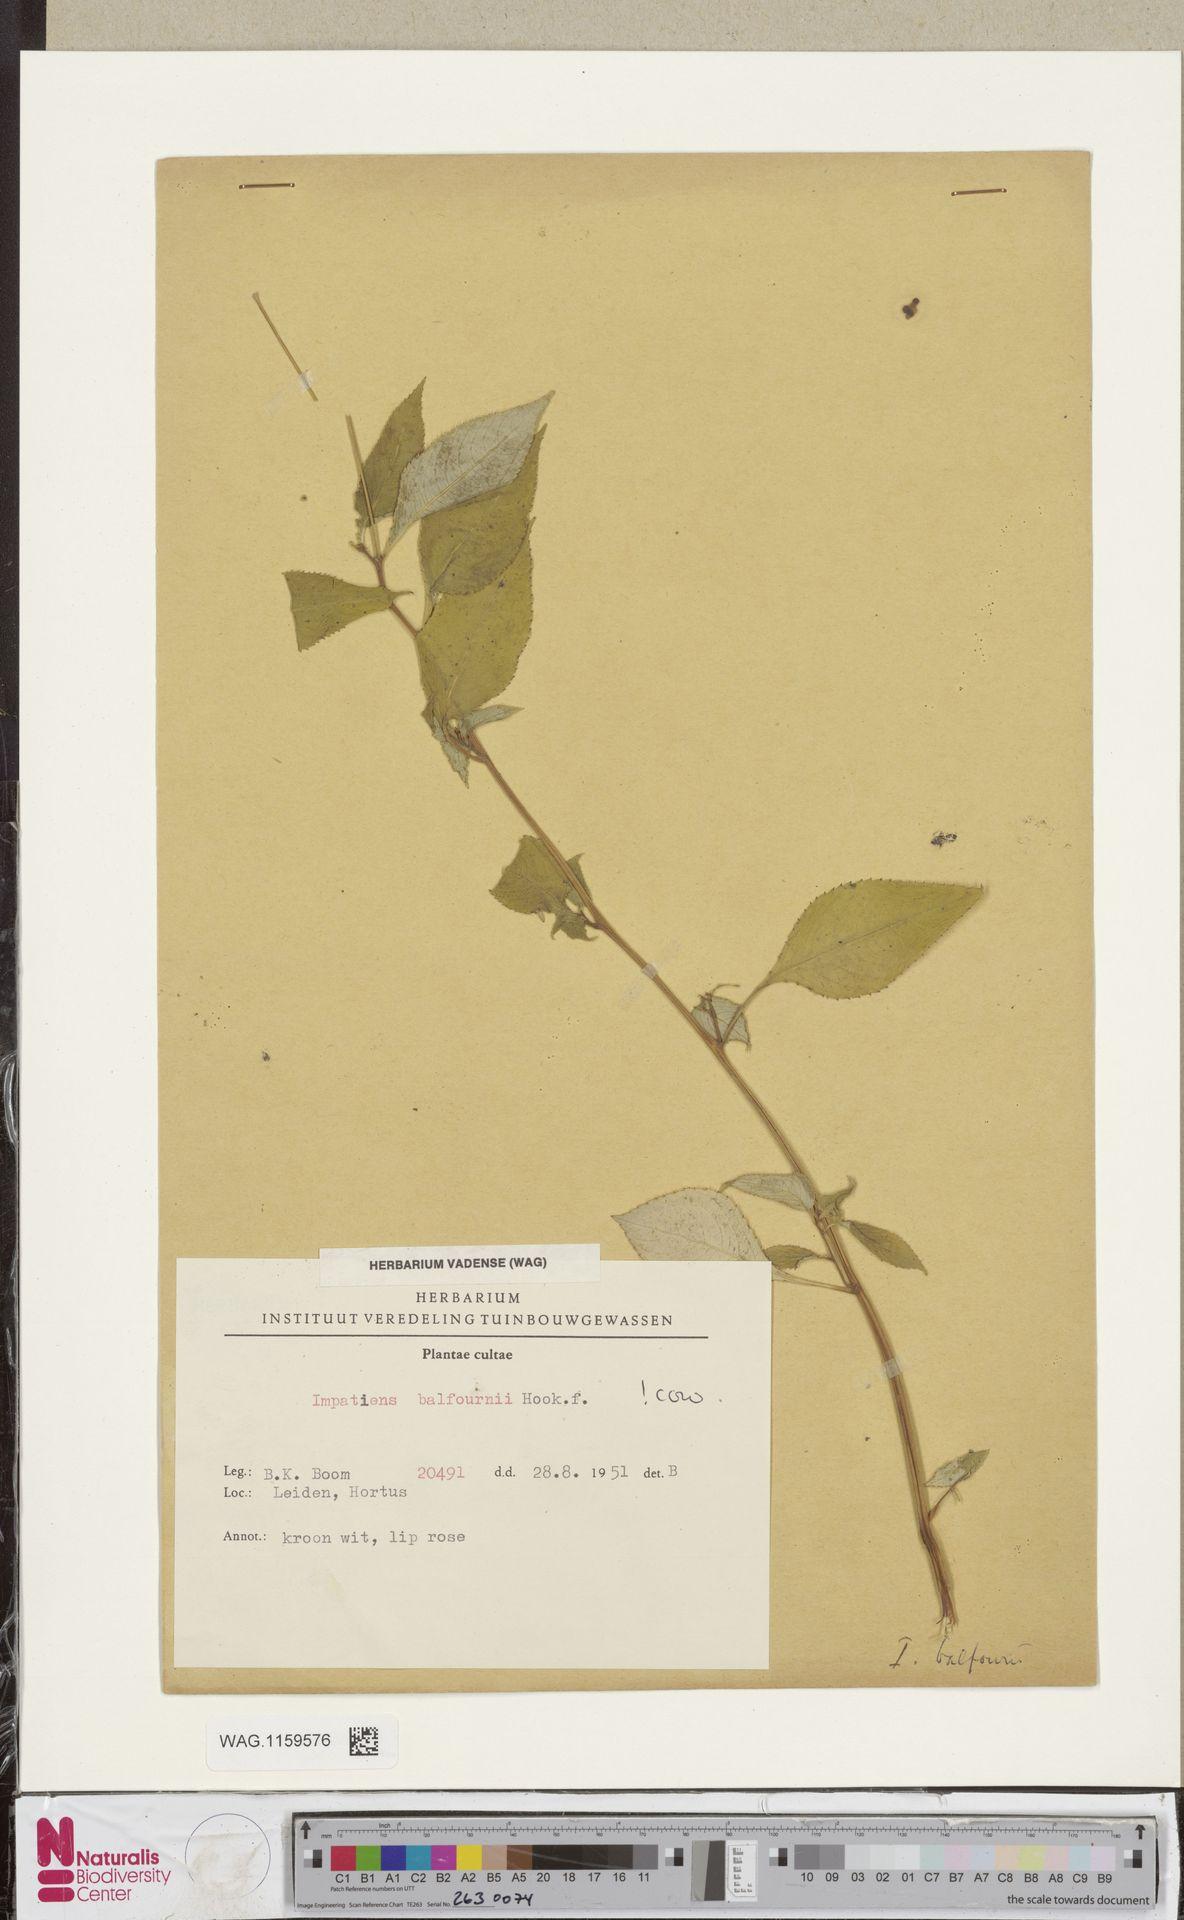 WAG.1159576 | Impatiens balfourii Hook.f.